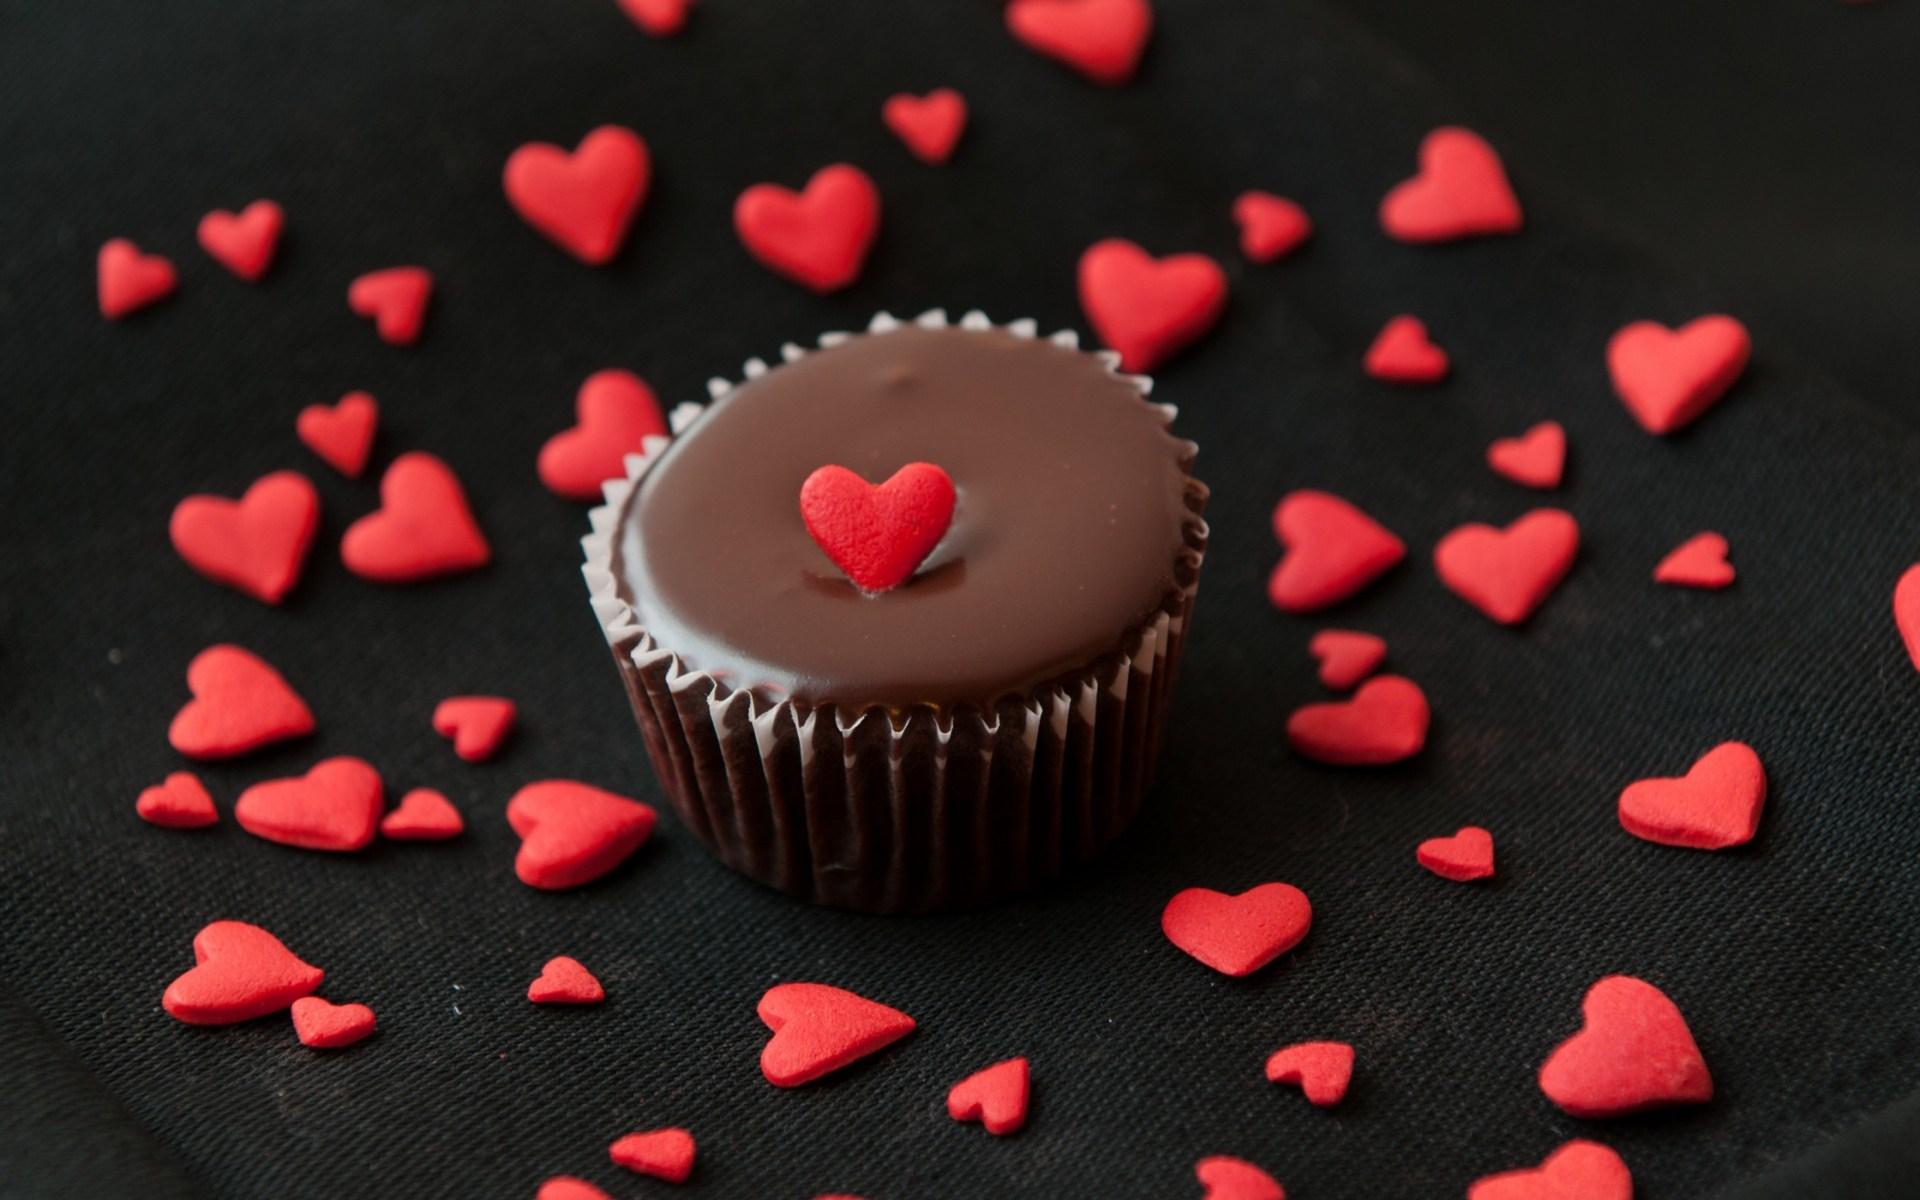 hinh nen chocolate 39